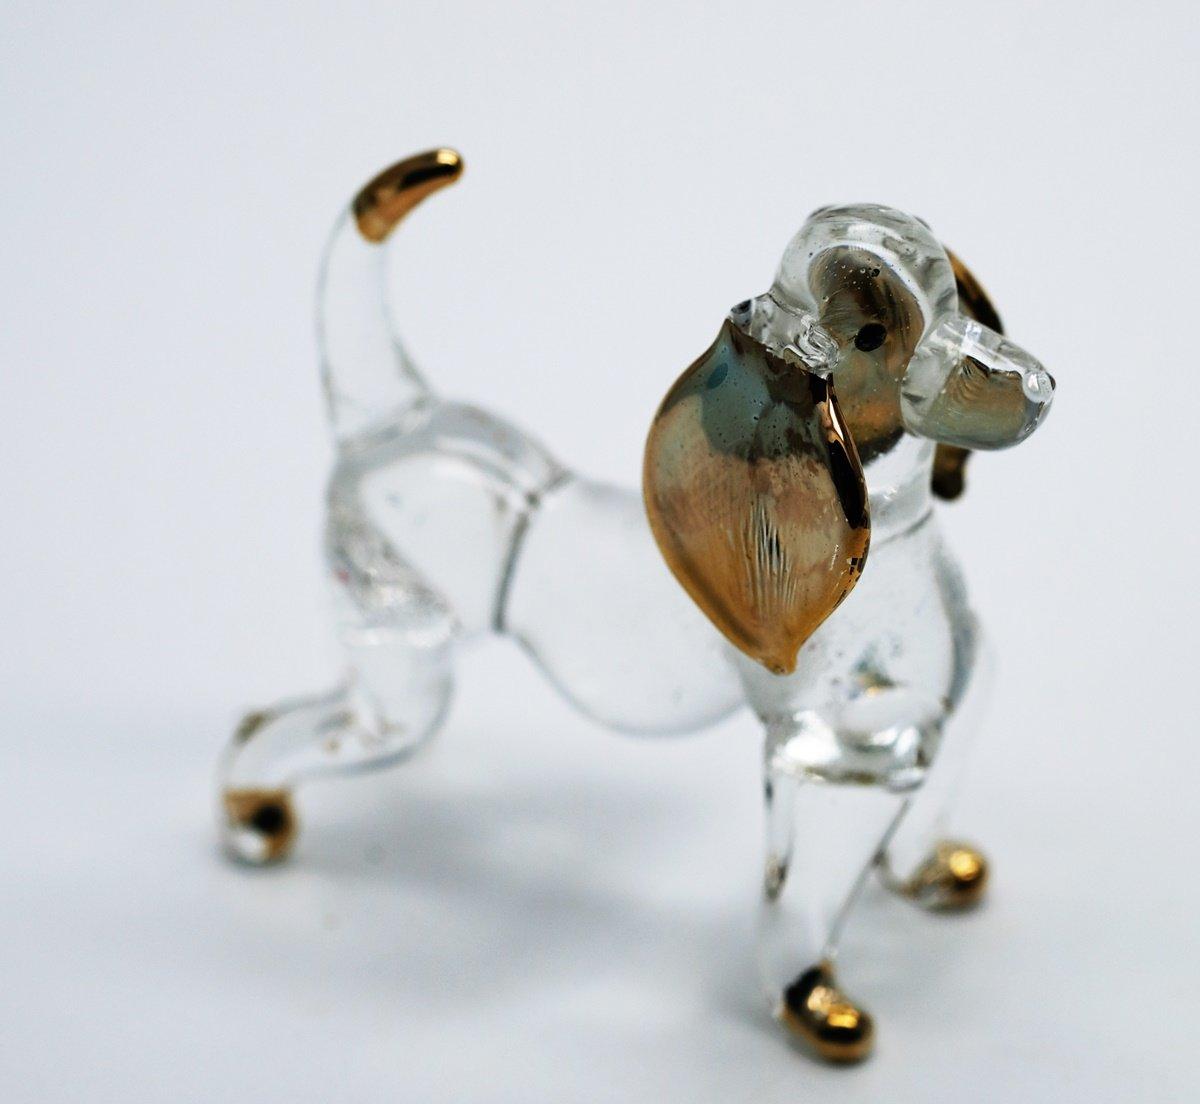 3 D Crystal Toy Gloden Basset Hound Hand Bowl Glass Dollhouse Miniatures Decoration CoolPrice Glass